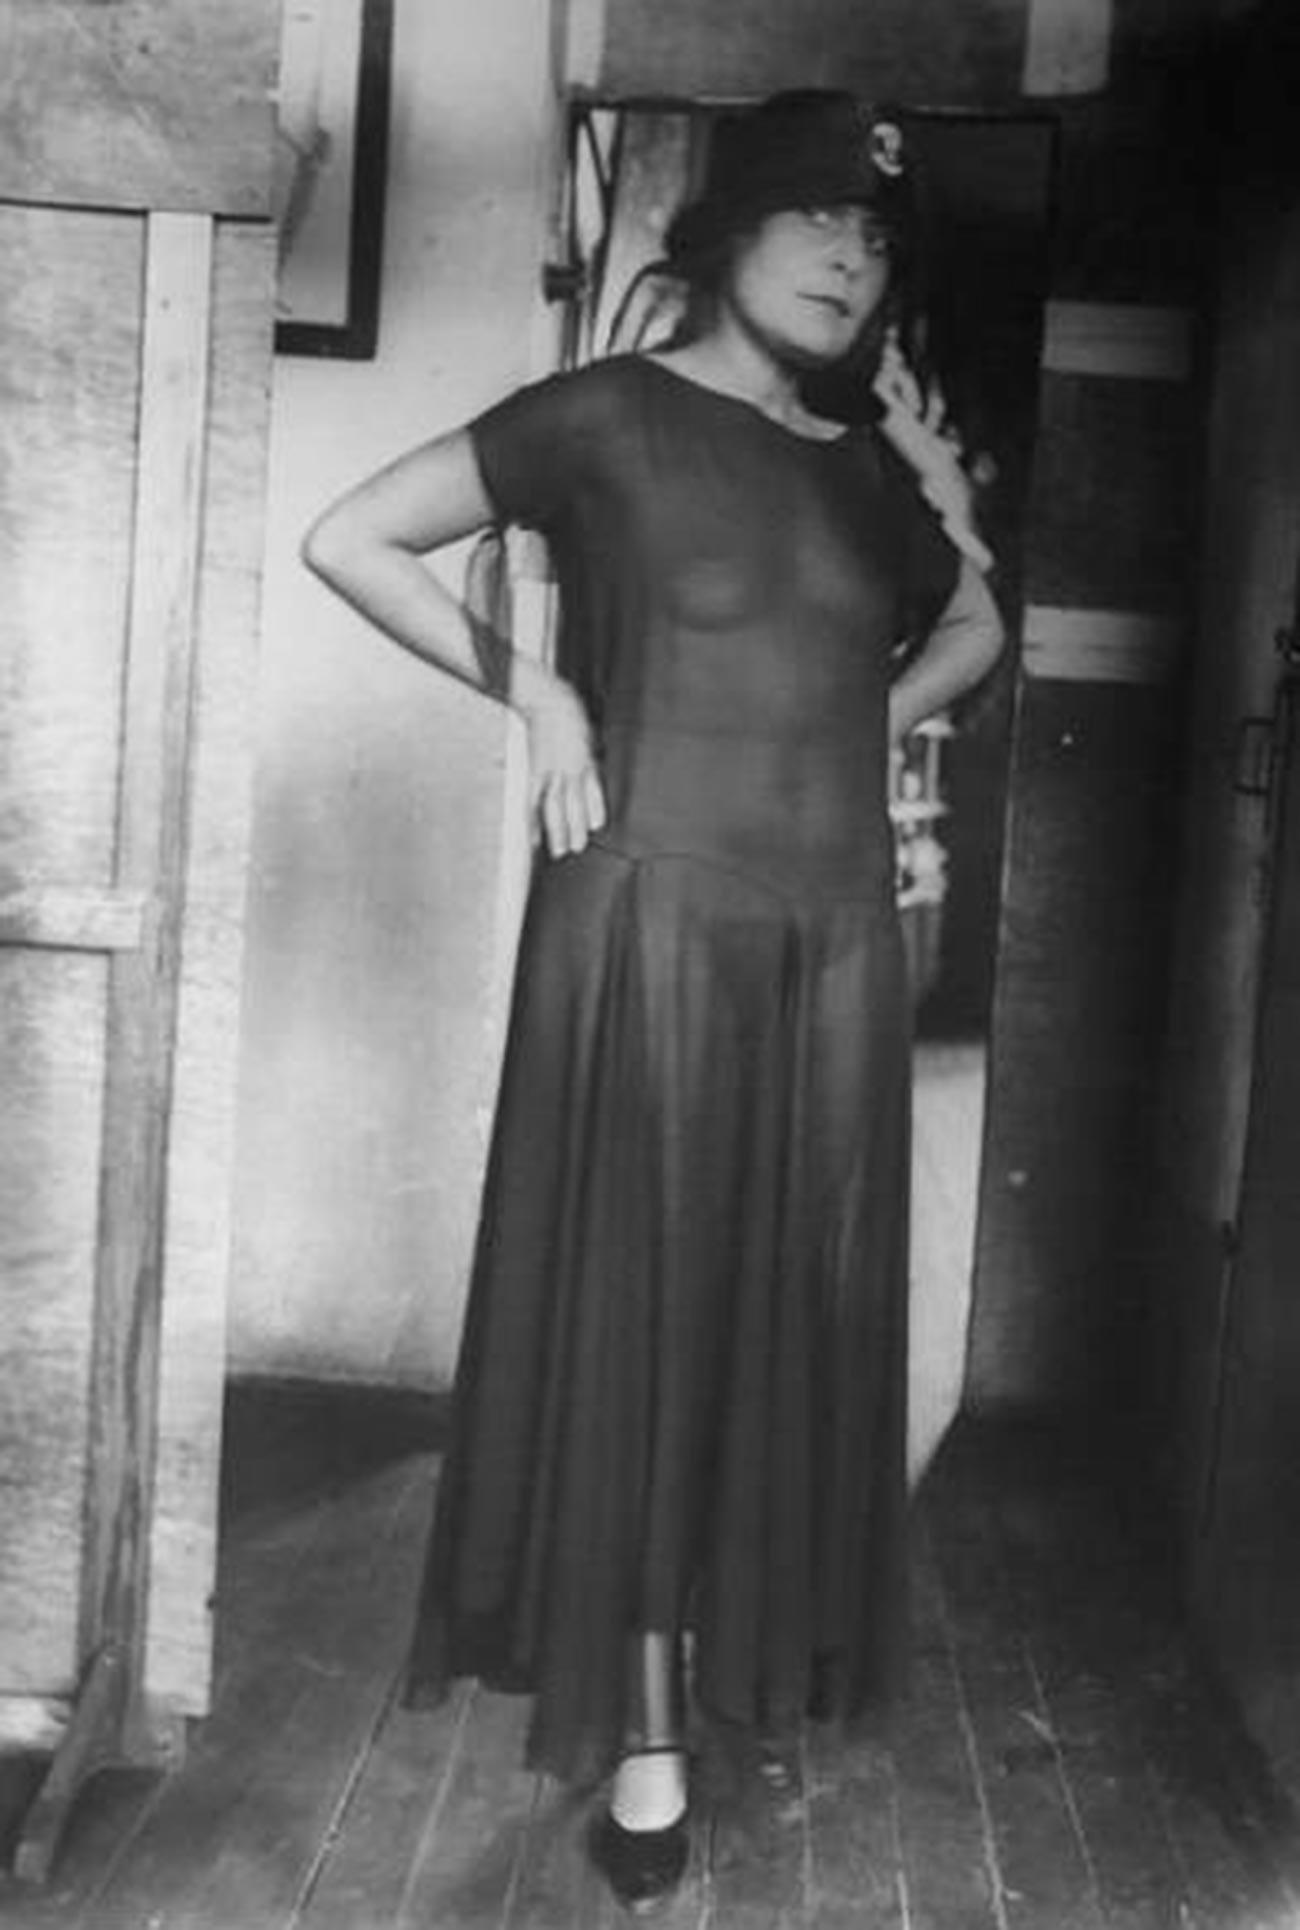 Lili Brik, musa del poeta Vladímir Maikovski con un vestido transparante, 1924.